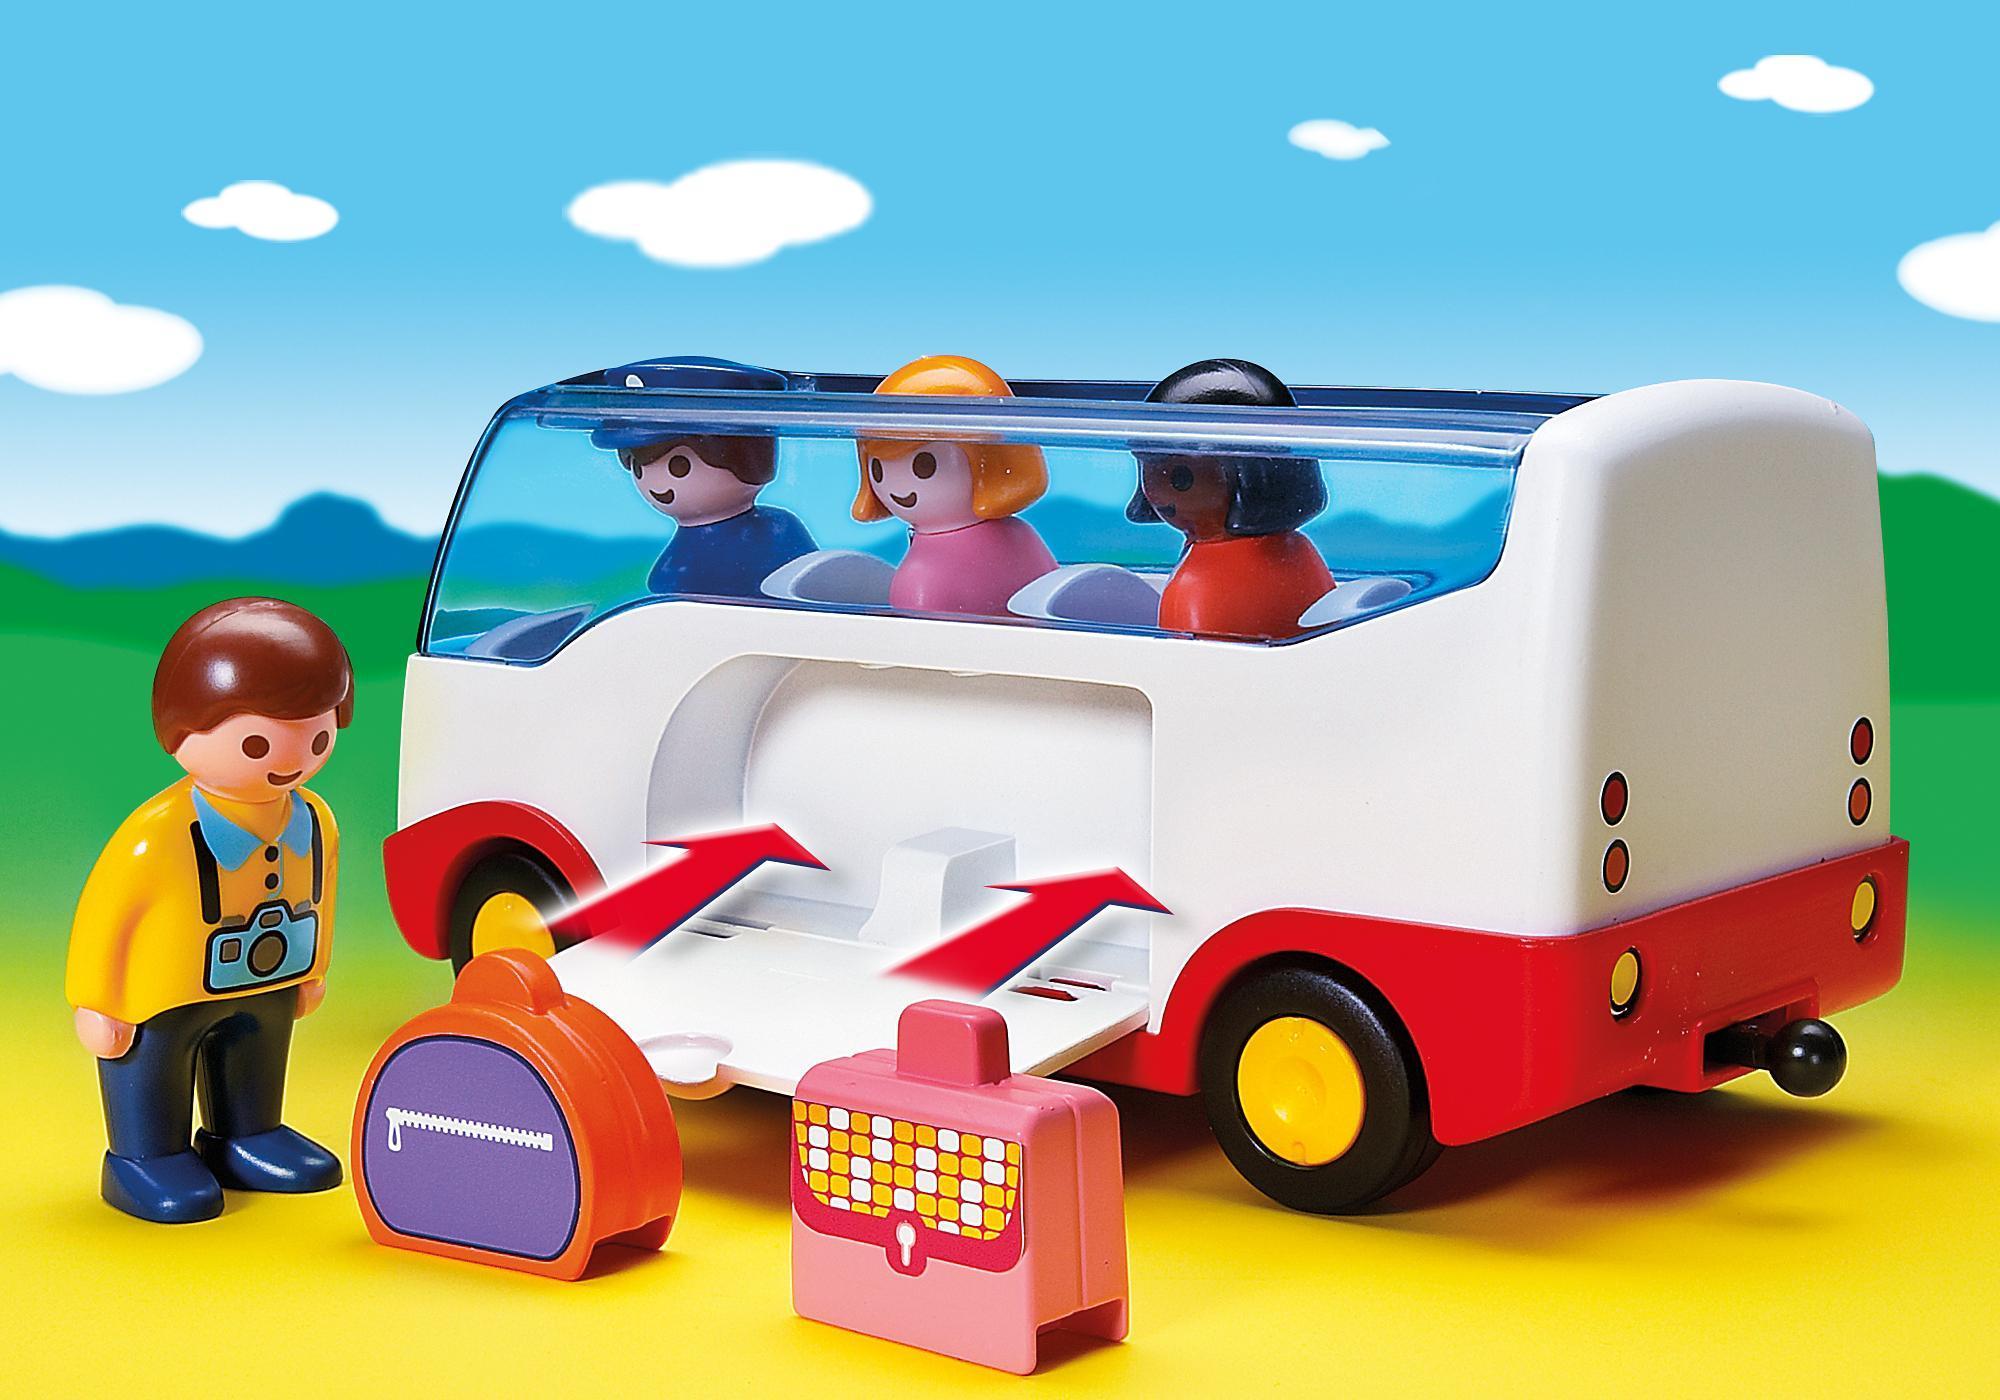 http://media.playmobil.com/i/playmobil/6773_product_extra1/1.2.3 Airport Shuttle Bus